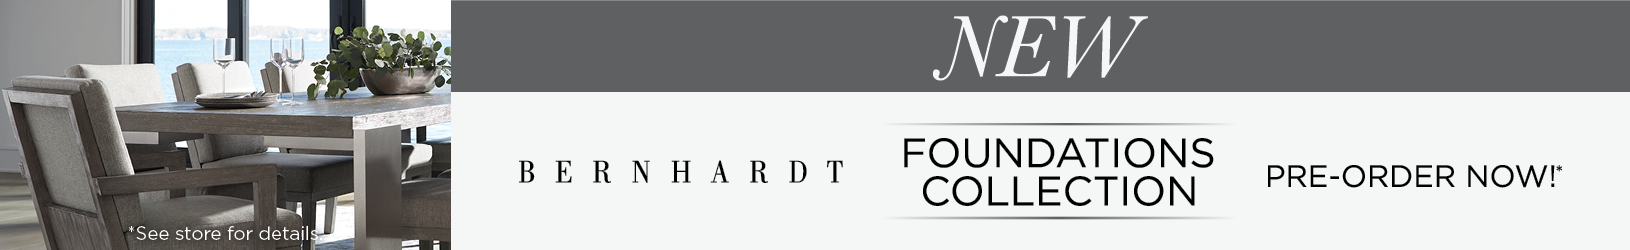 Bernhardt Foundations Collection